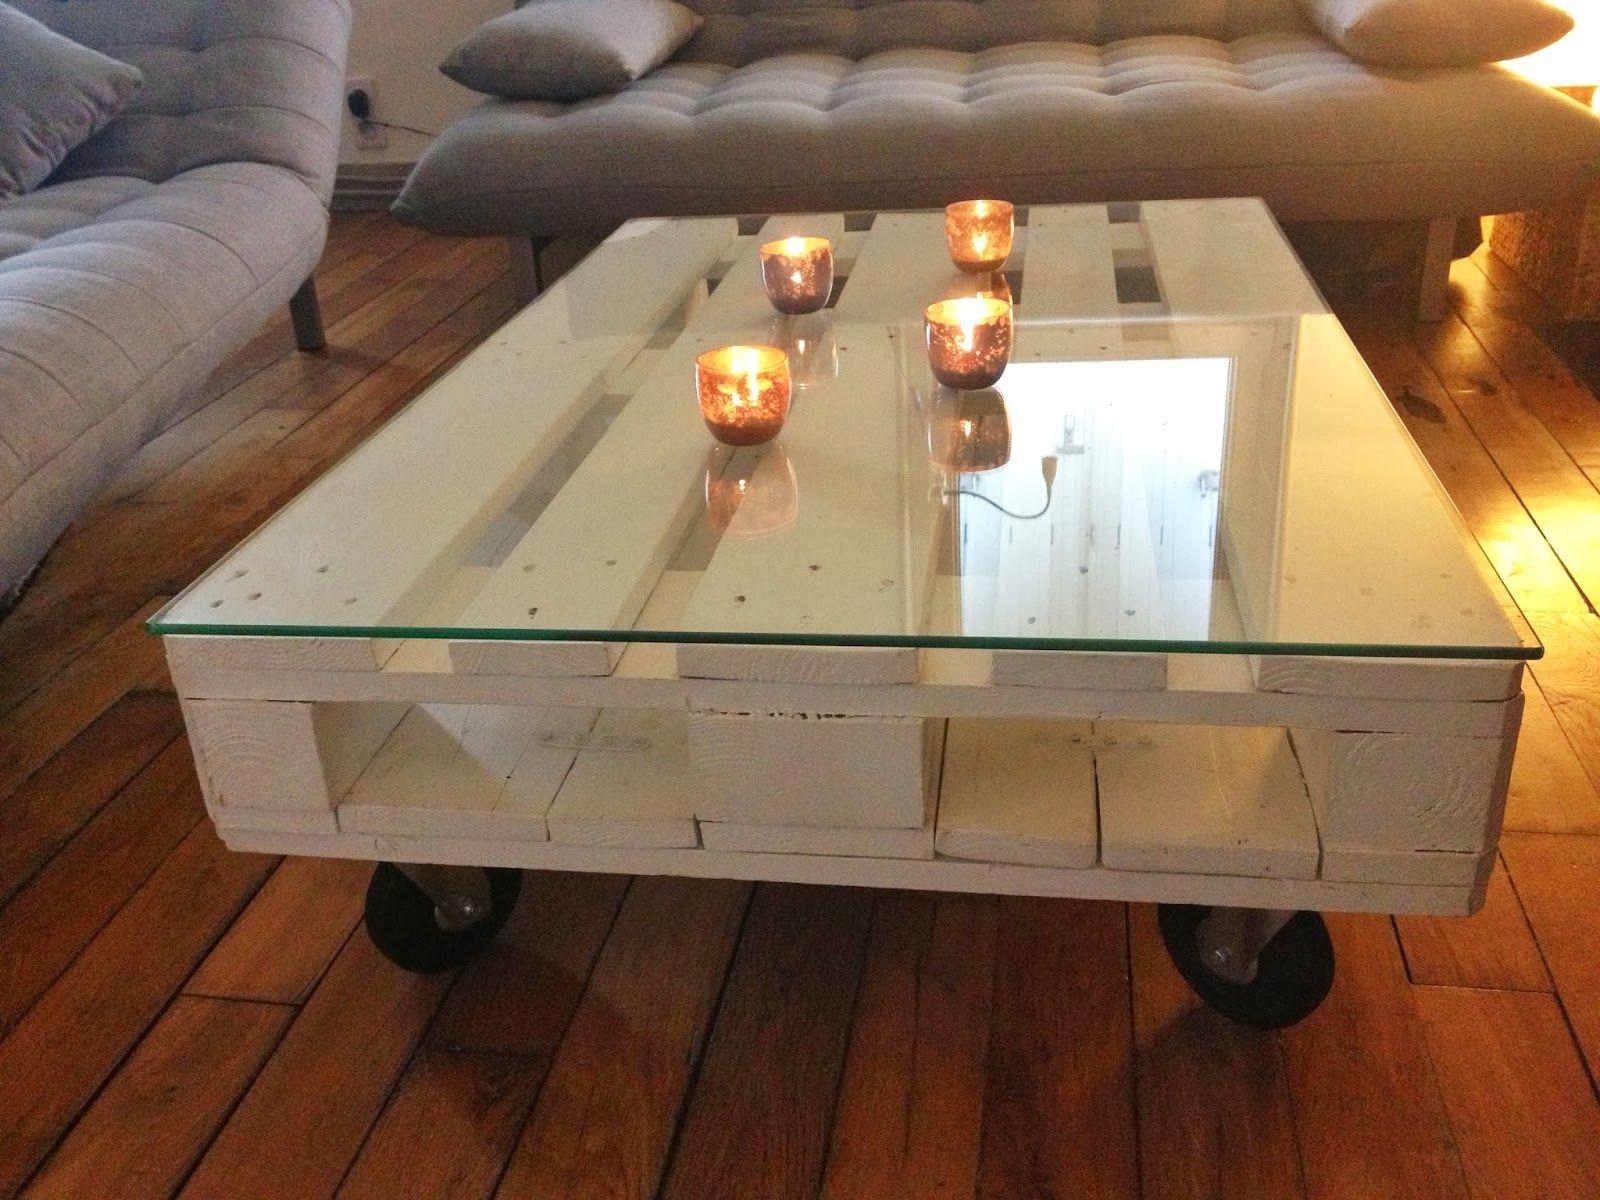 729f2a3bfa4f05eea22d73c7cf6b0851 Luxe De Table Basse Palette Verre Concept